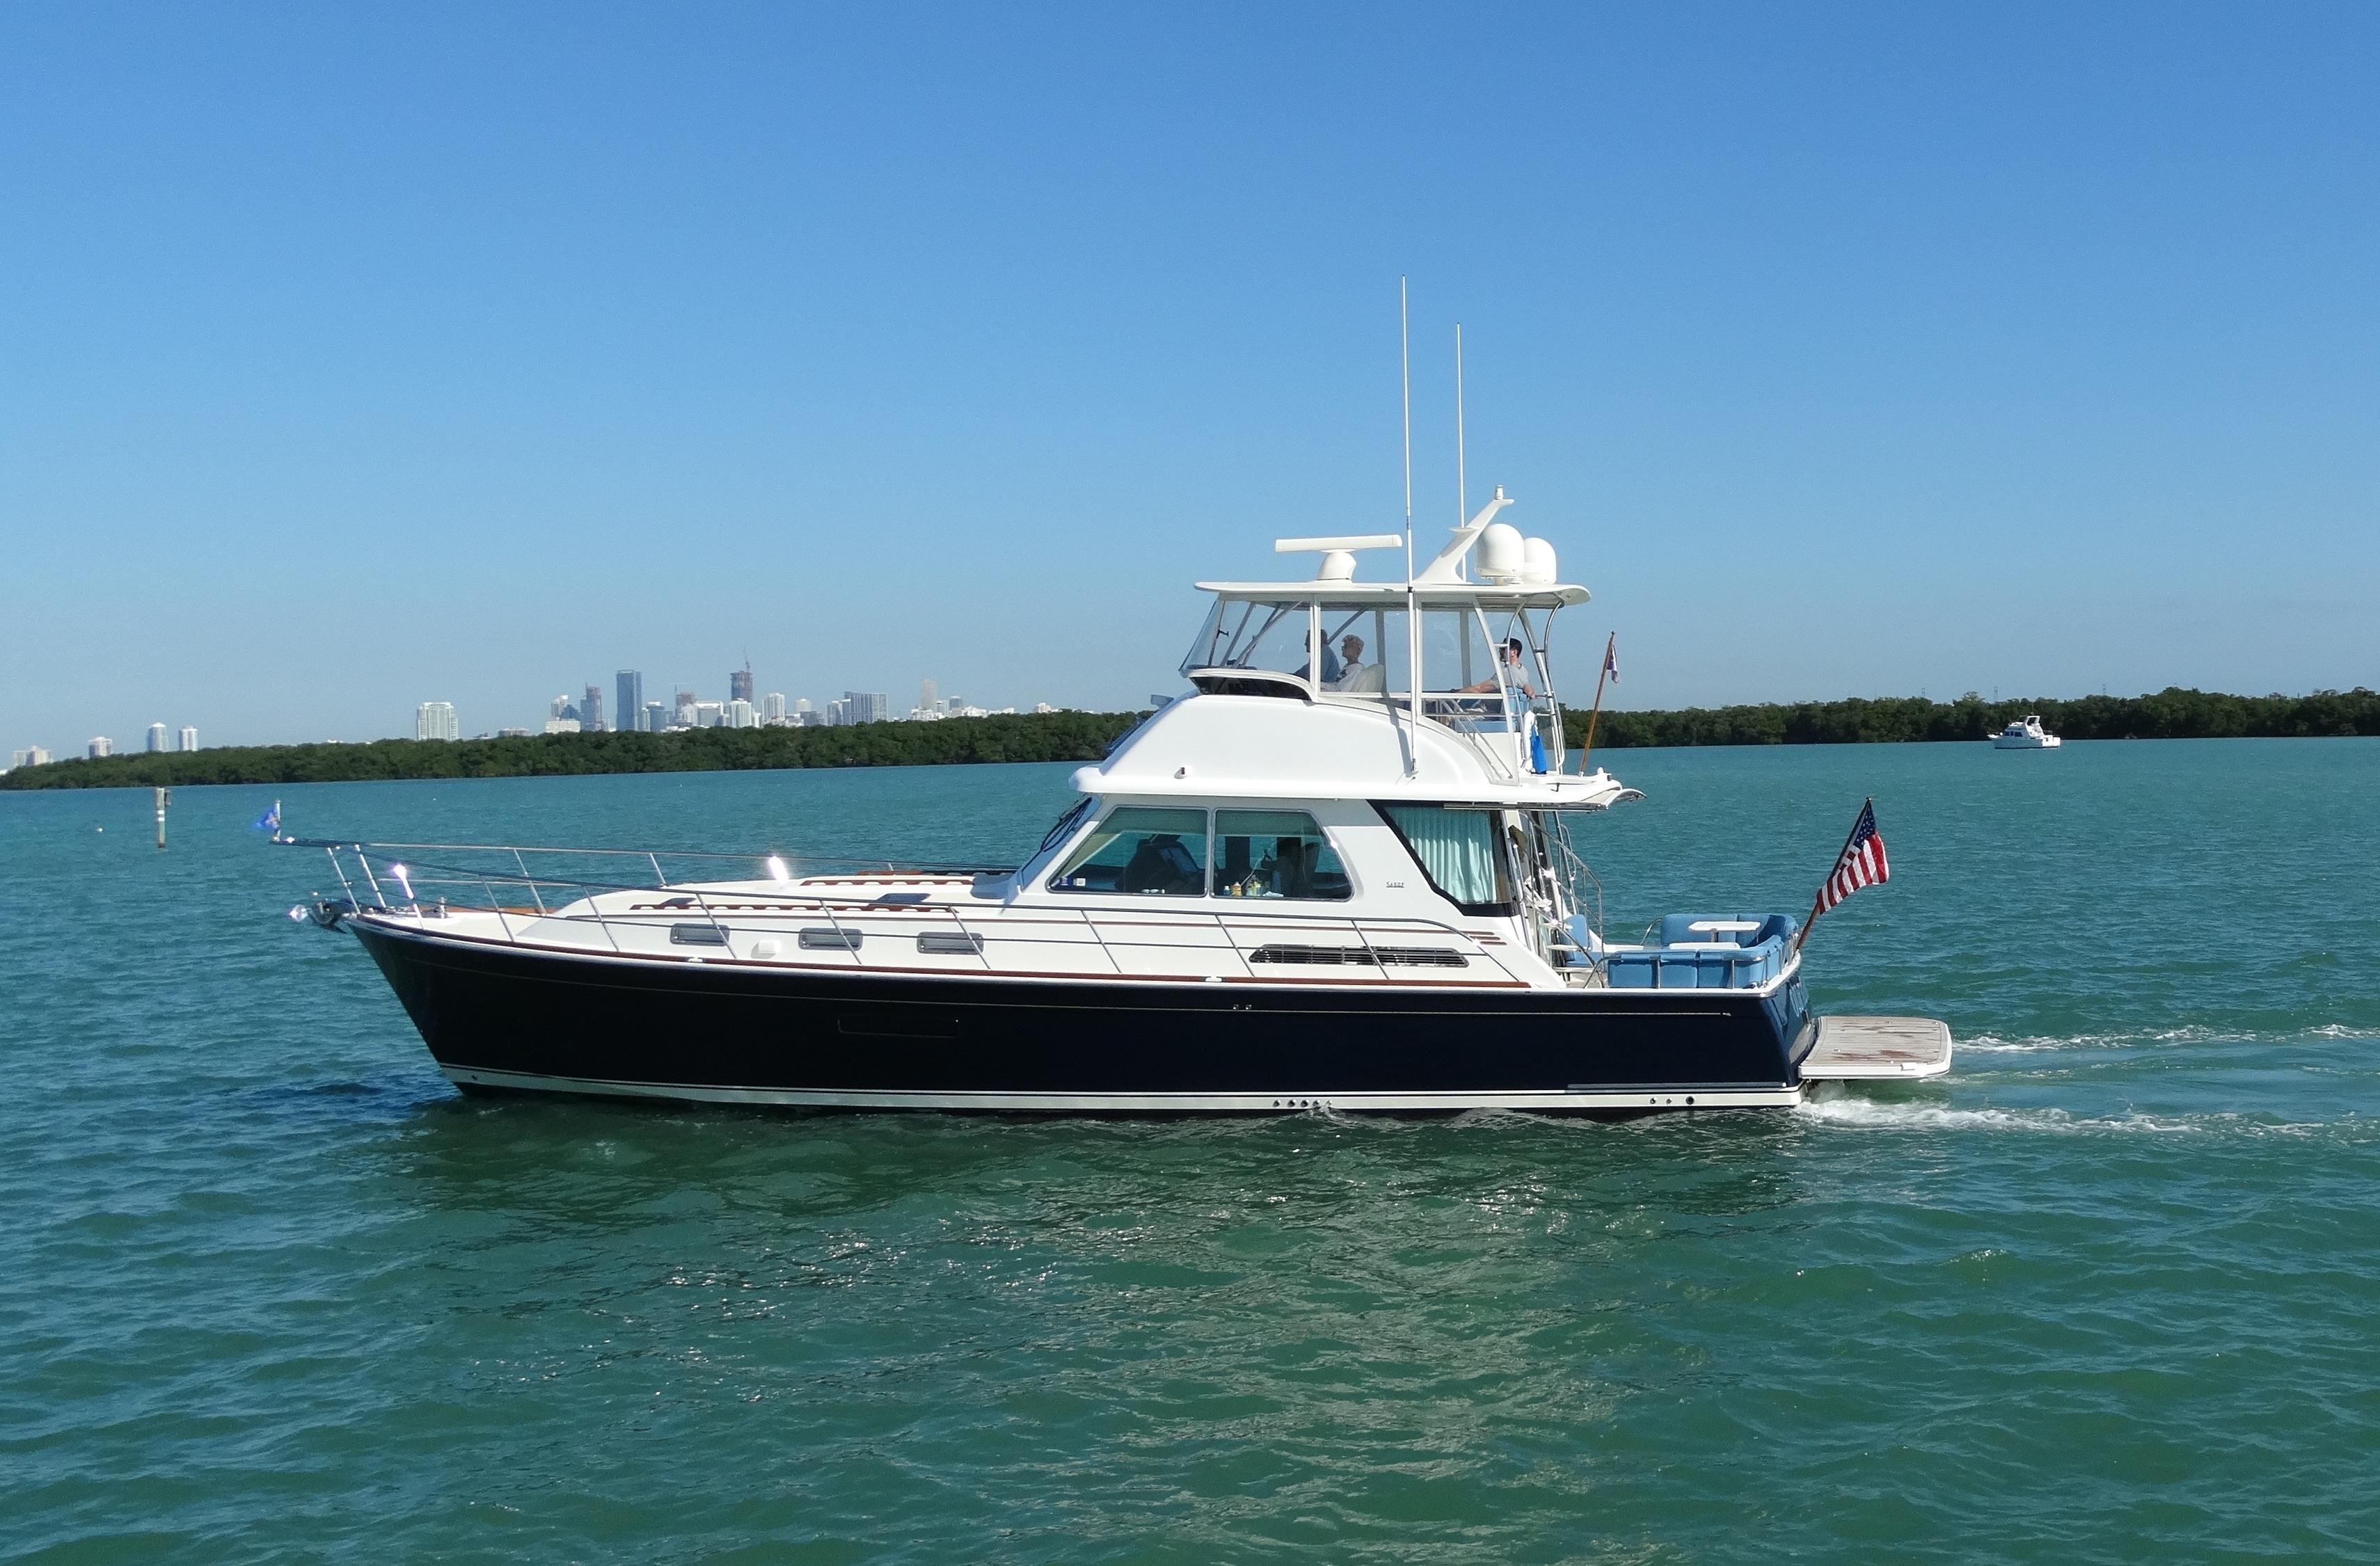 2015 sabre sedan power boat for sale for Dinghy motor for sale